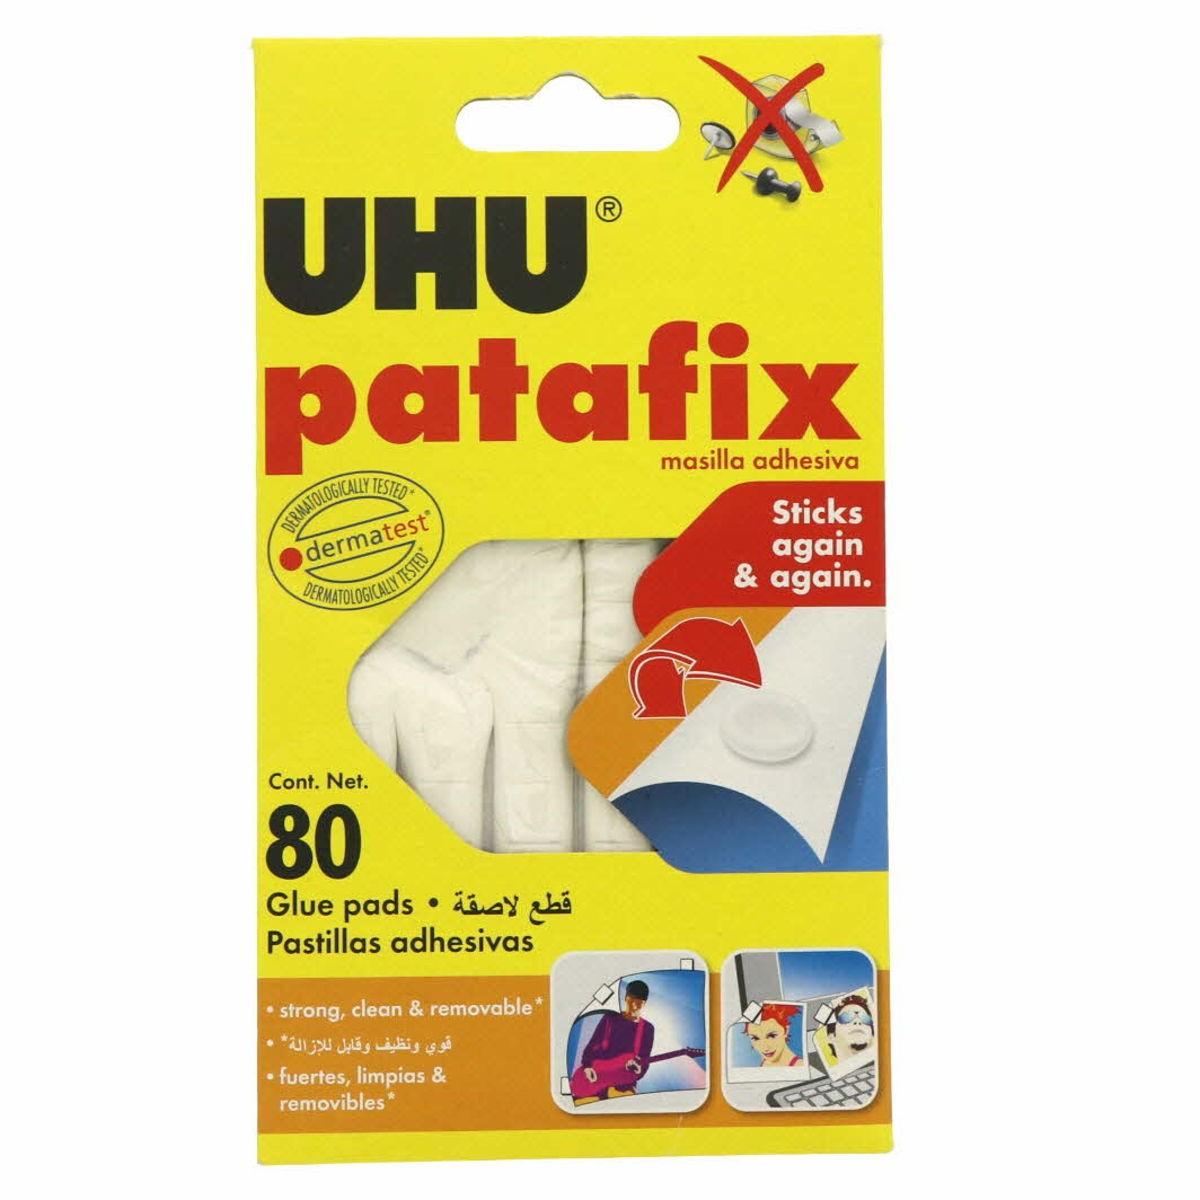 UHU Tac Patafix Glue